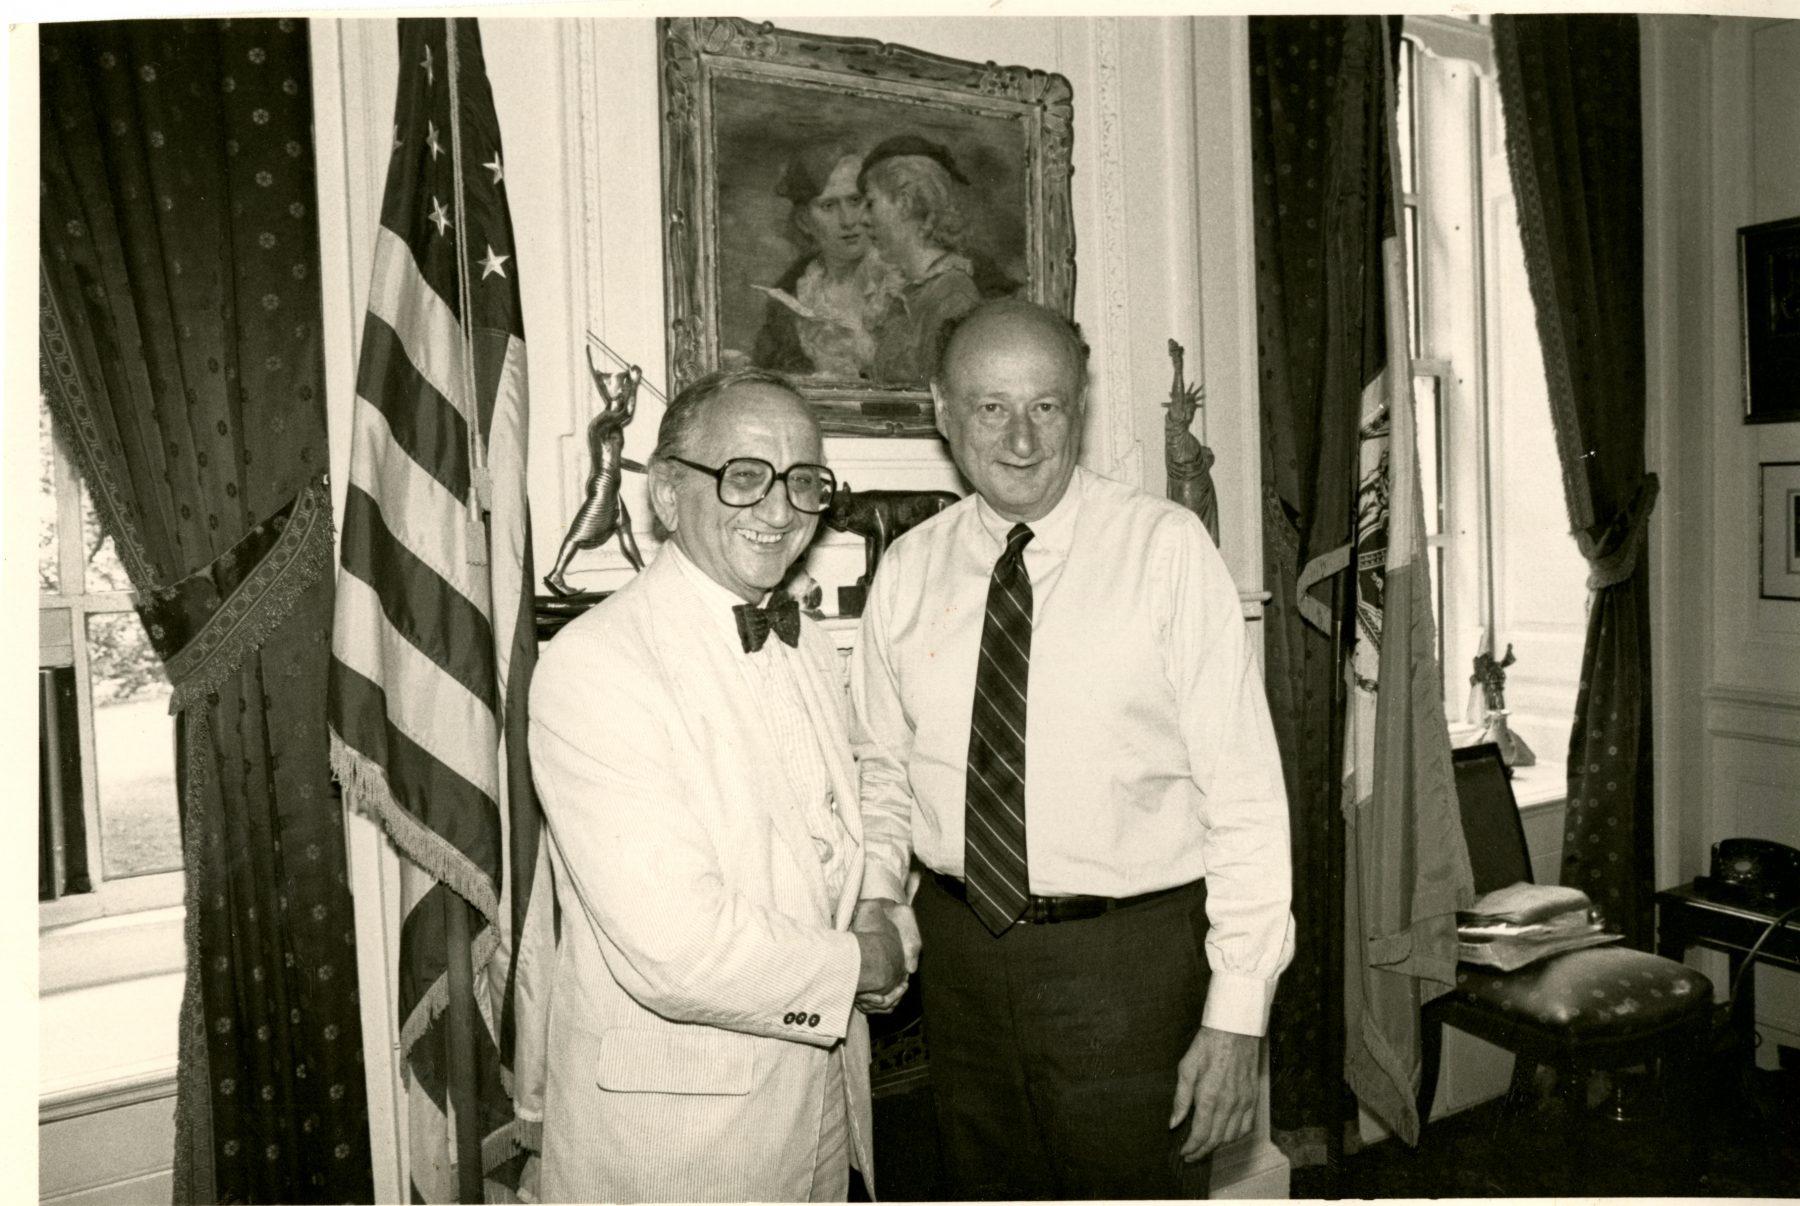 03 April 2019 Posted. Emile Bocian with Ed Koch, October 17, 1984. Museum of Chinese in America (MOCA) Emile Bocian Collection. 包信和Ed Koch,1984年10月17日。包信档案,美国华人博物馆(MOCA)馆藏